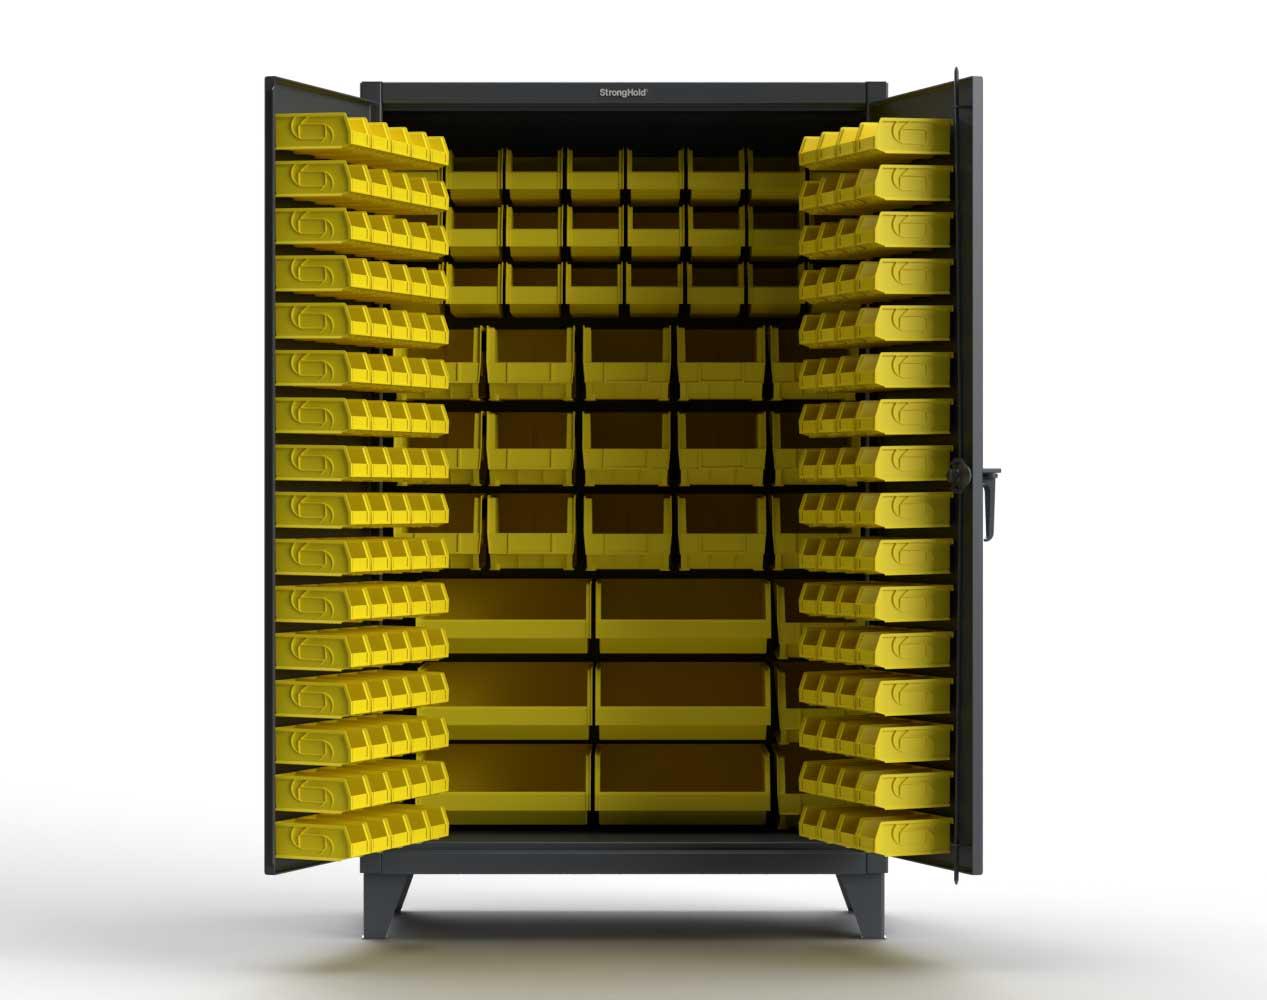 Extra Heavy Duty 12 GA  Industrial Cabinet with Multiple Sized Bins – 60 In. W x 24 In. D x 78 In. H